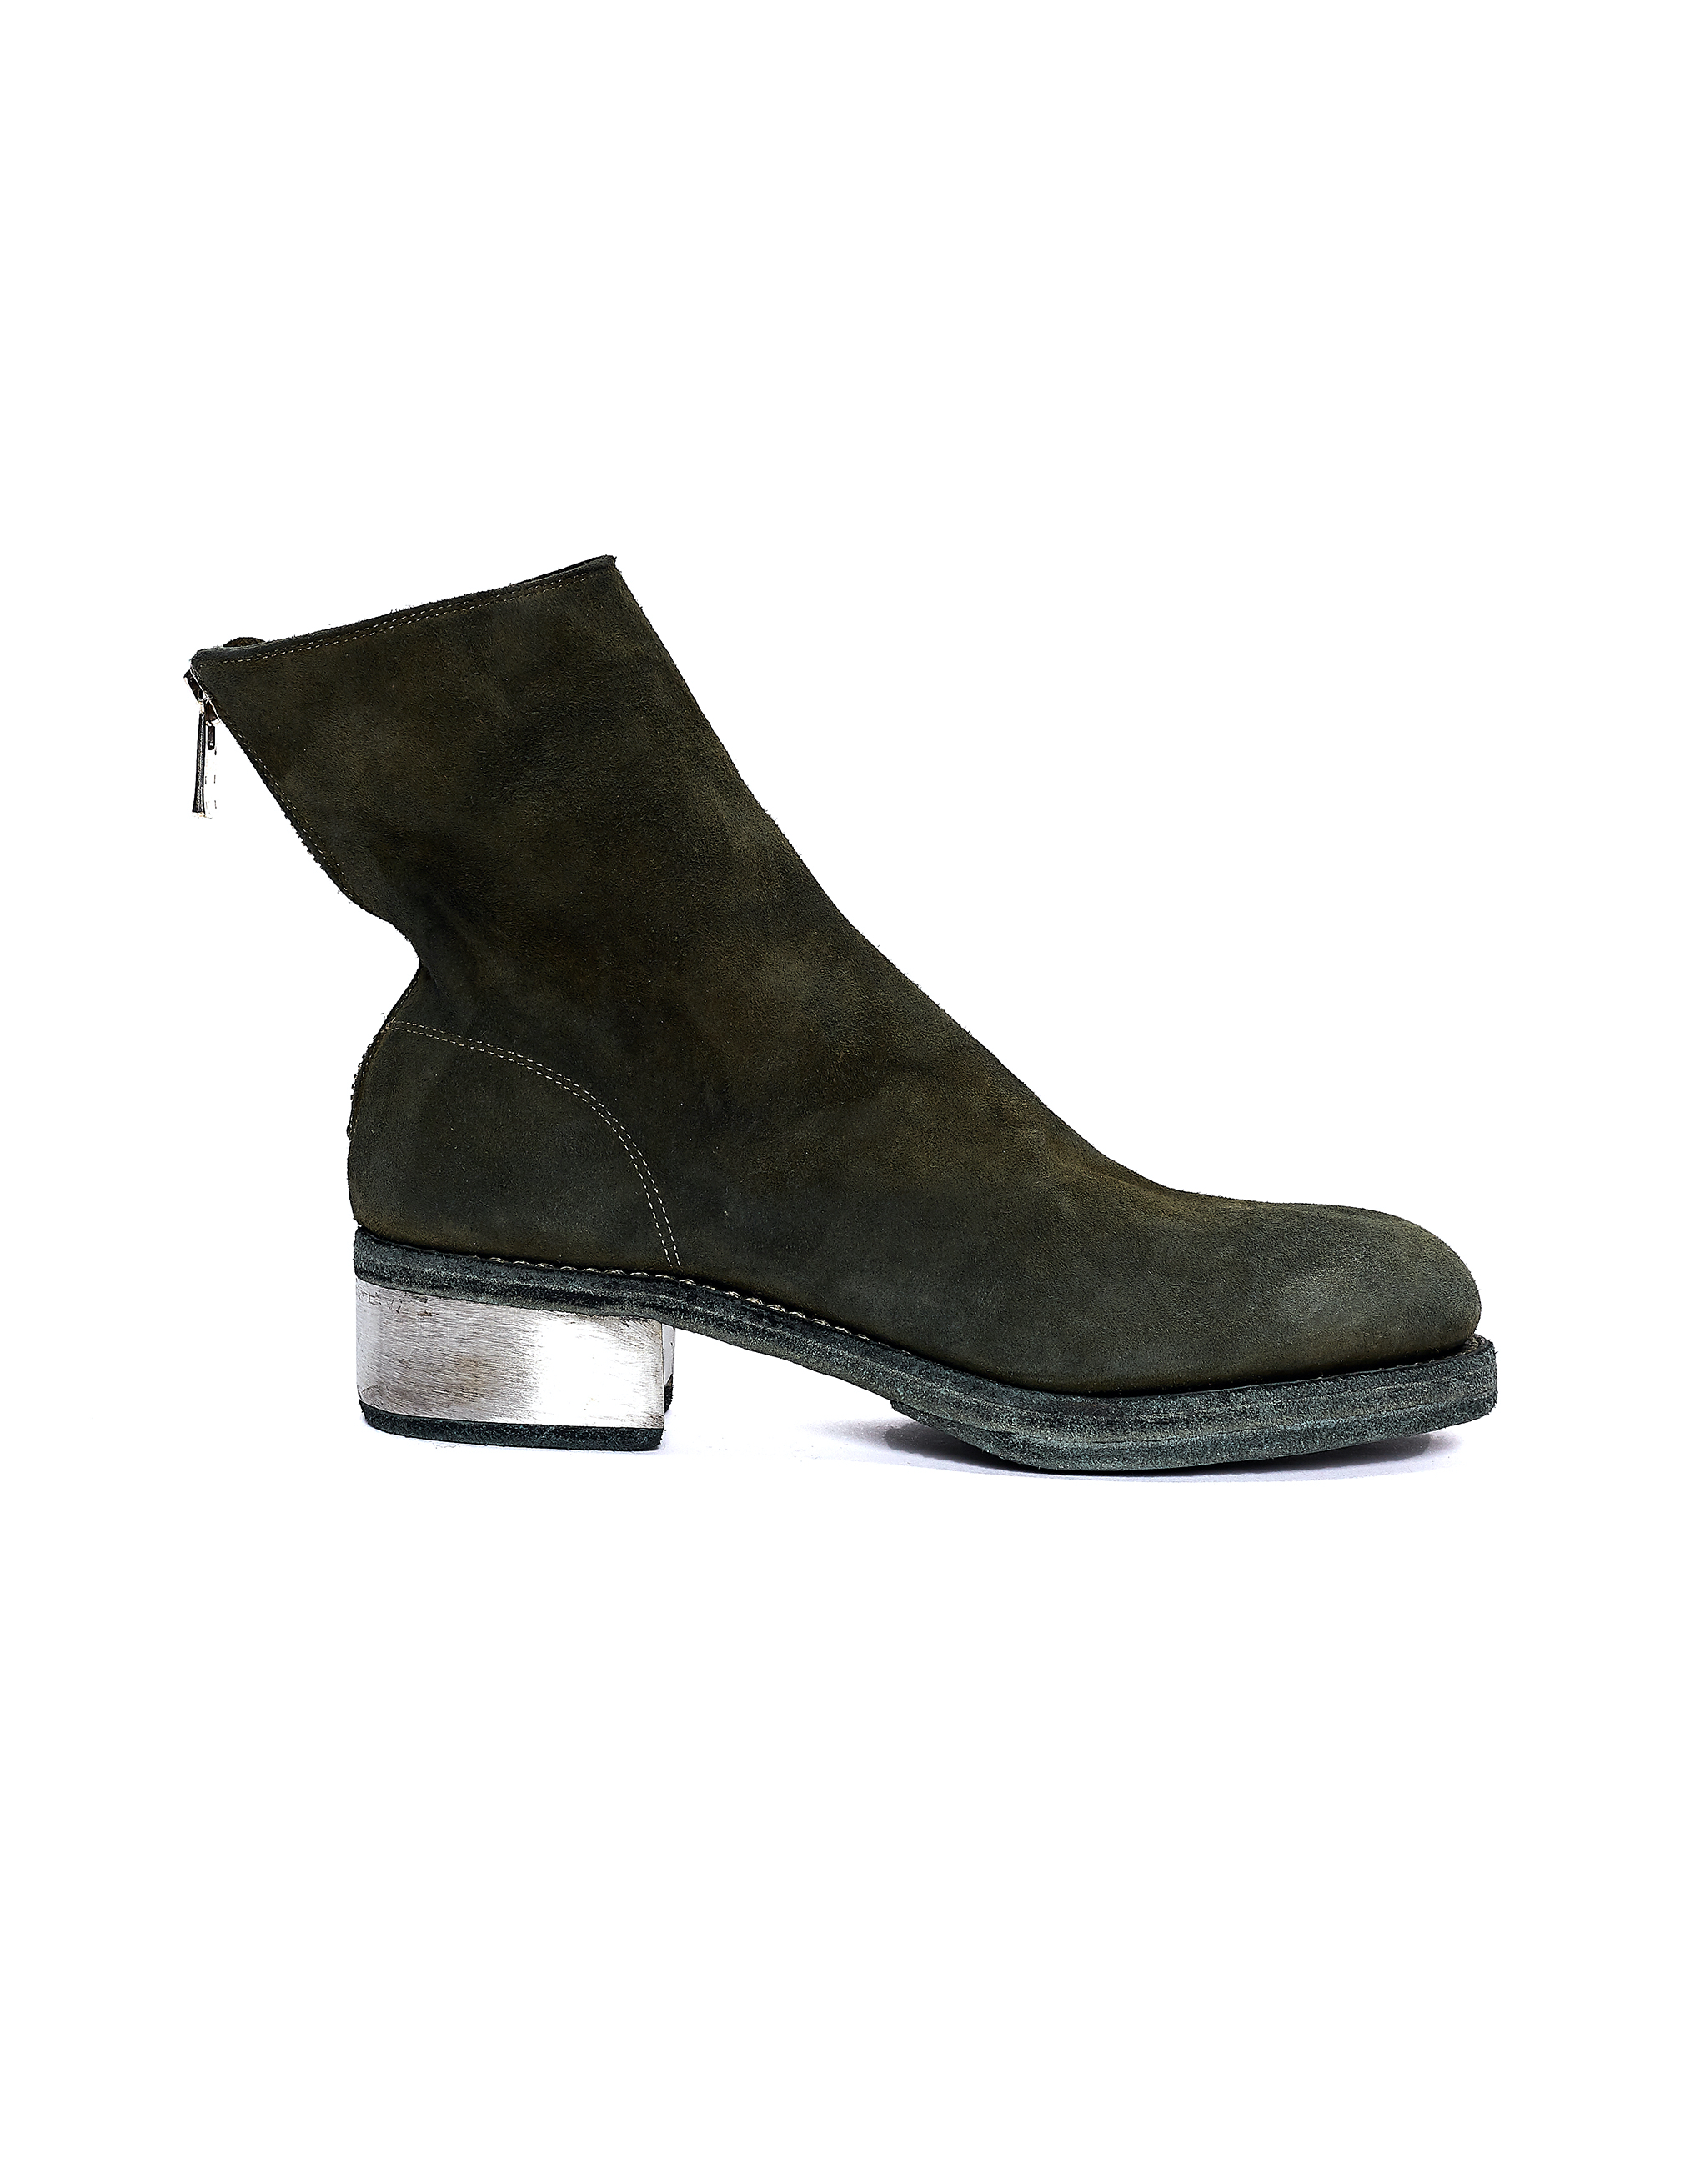 Guidi Green Suede Metallic Heel Boots